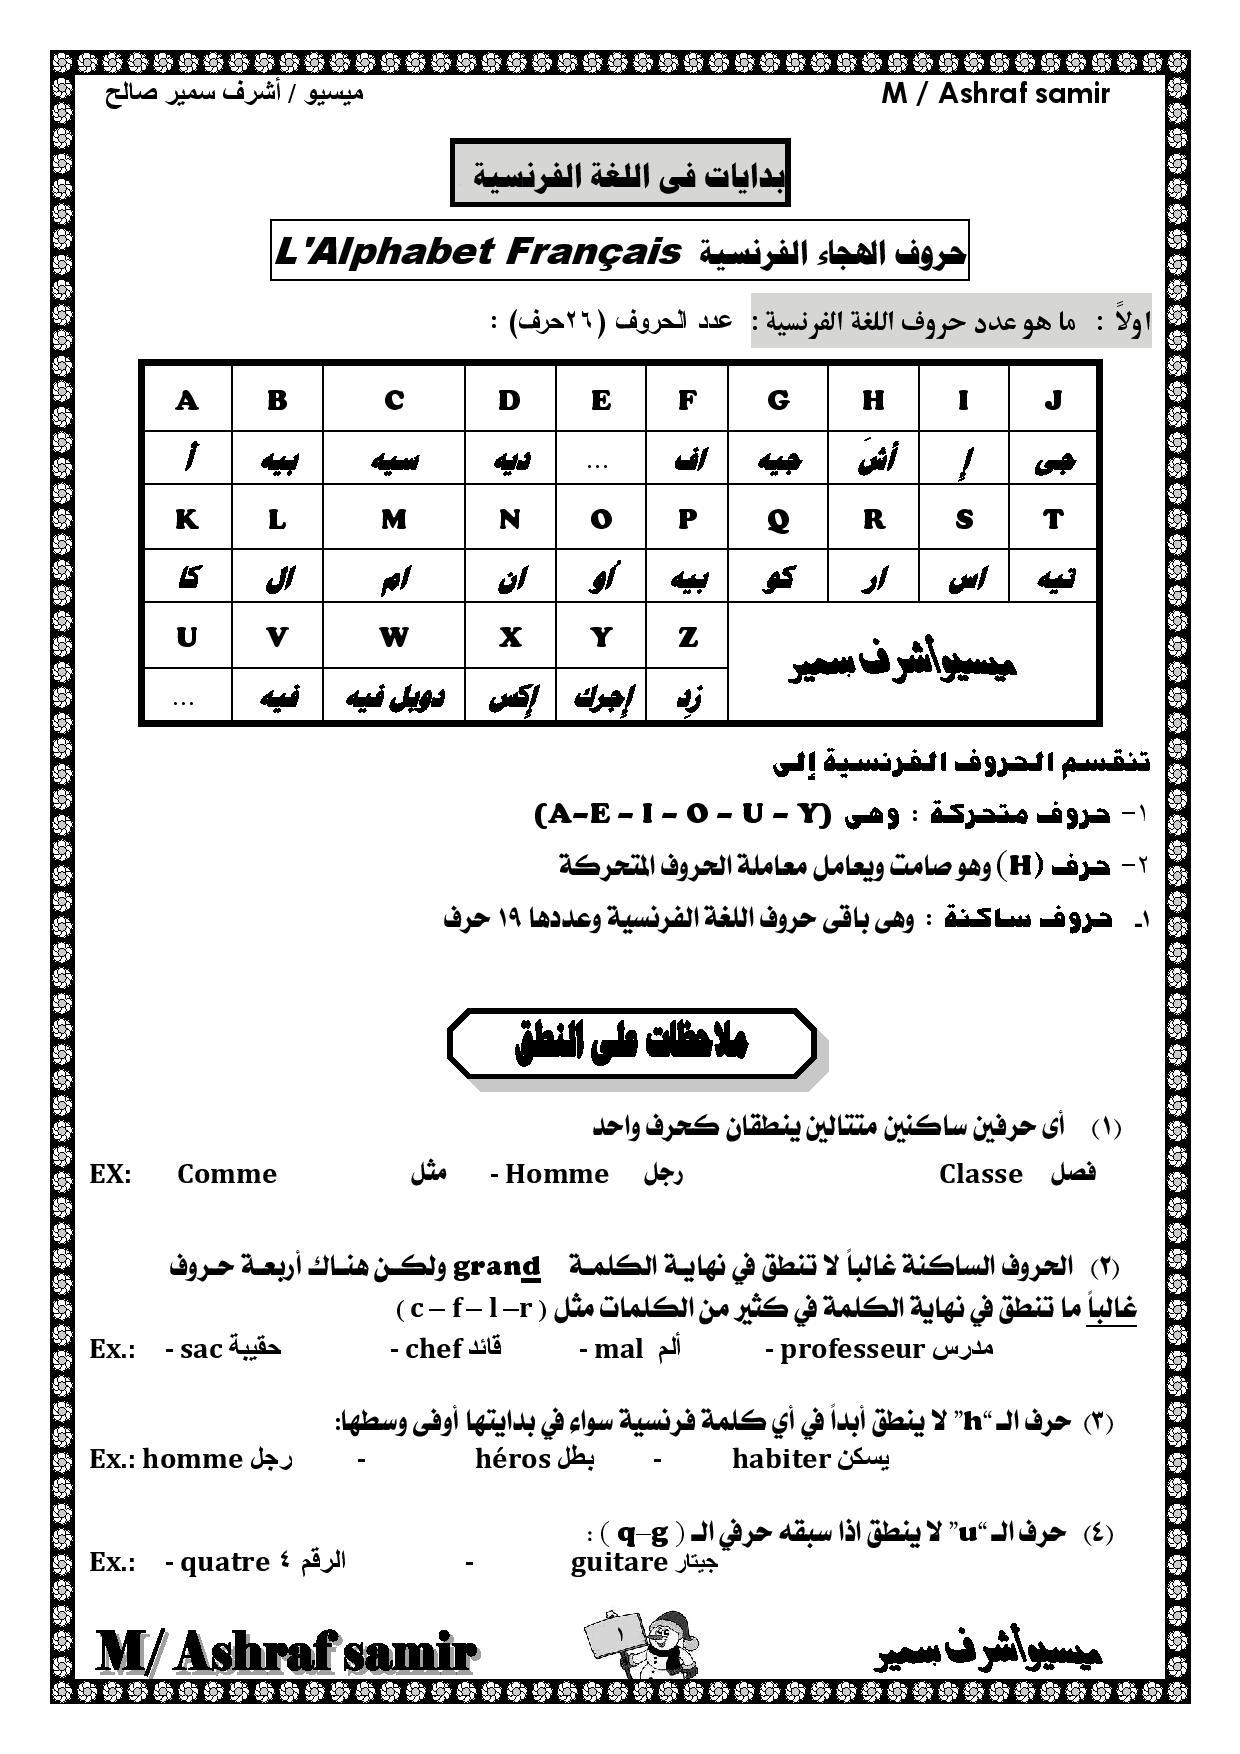 exam-eg.com_1464829558411.jpg